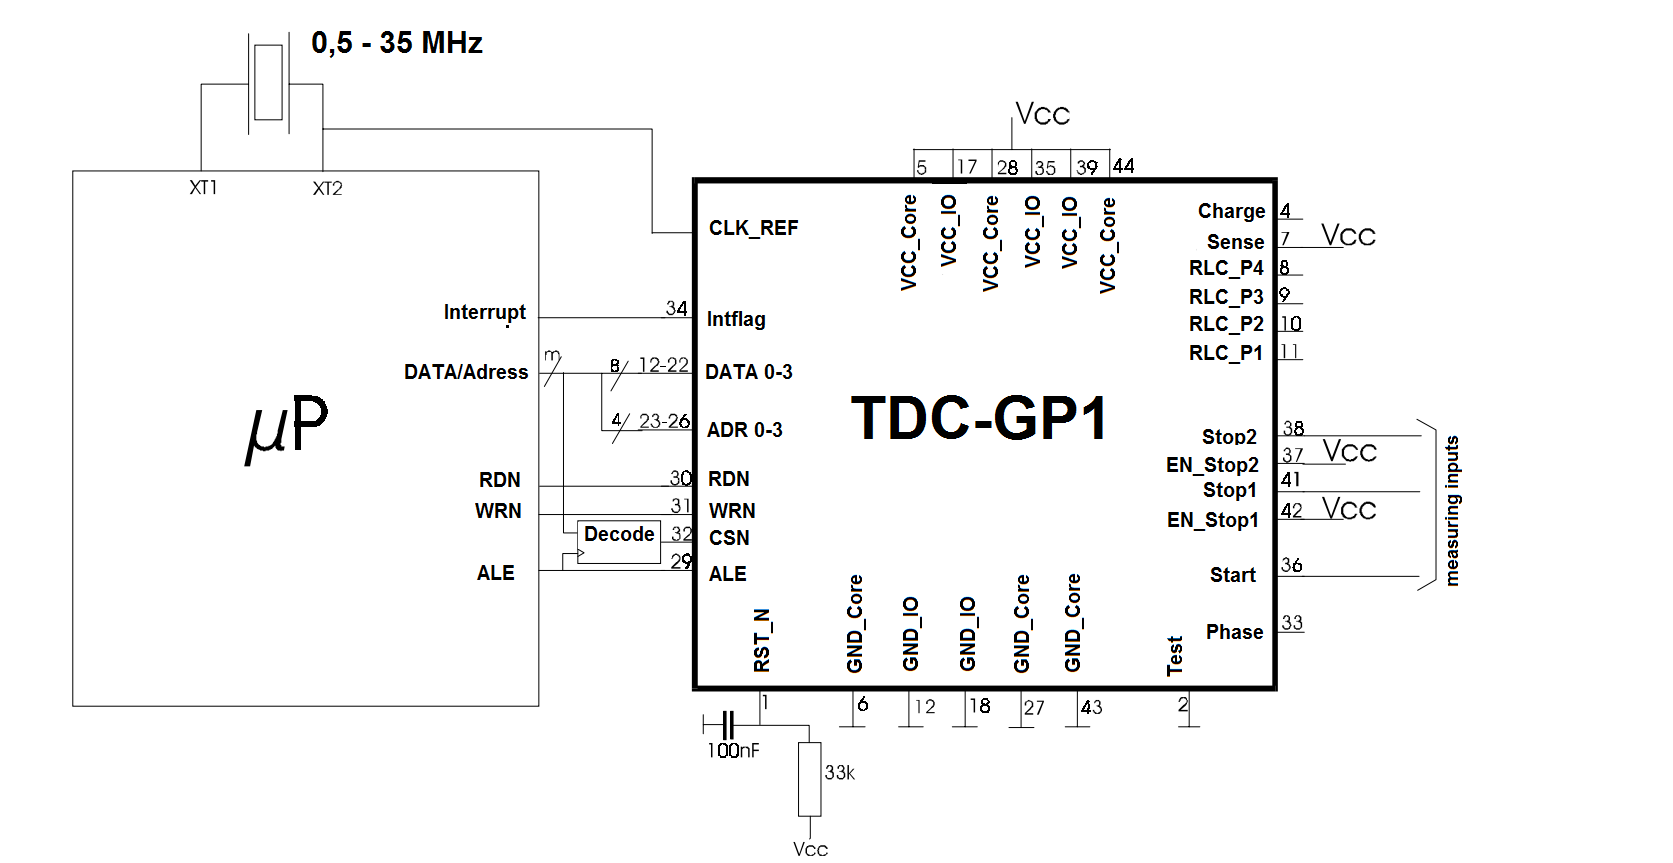 TDC-GP1